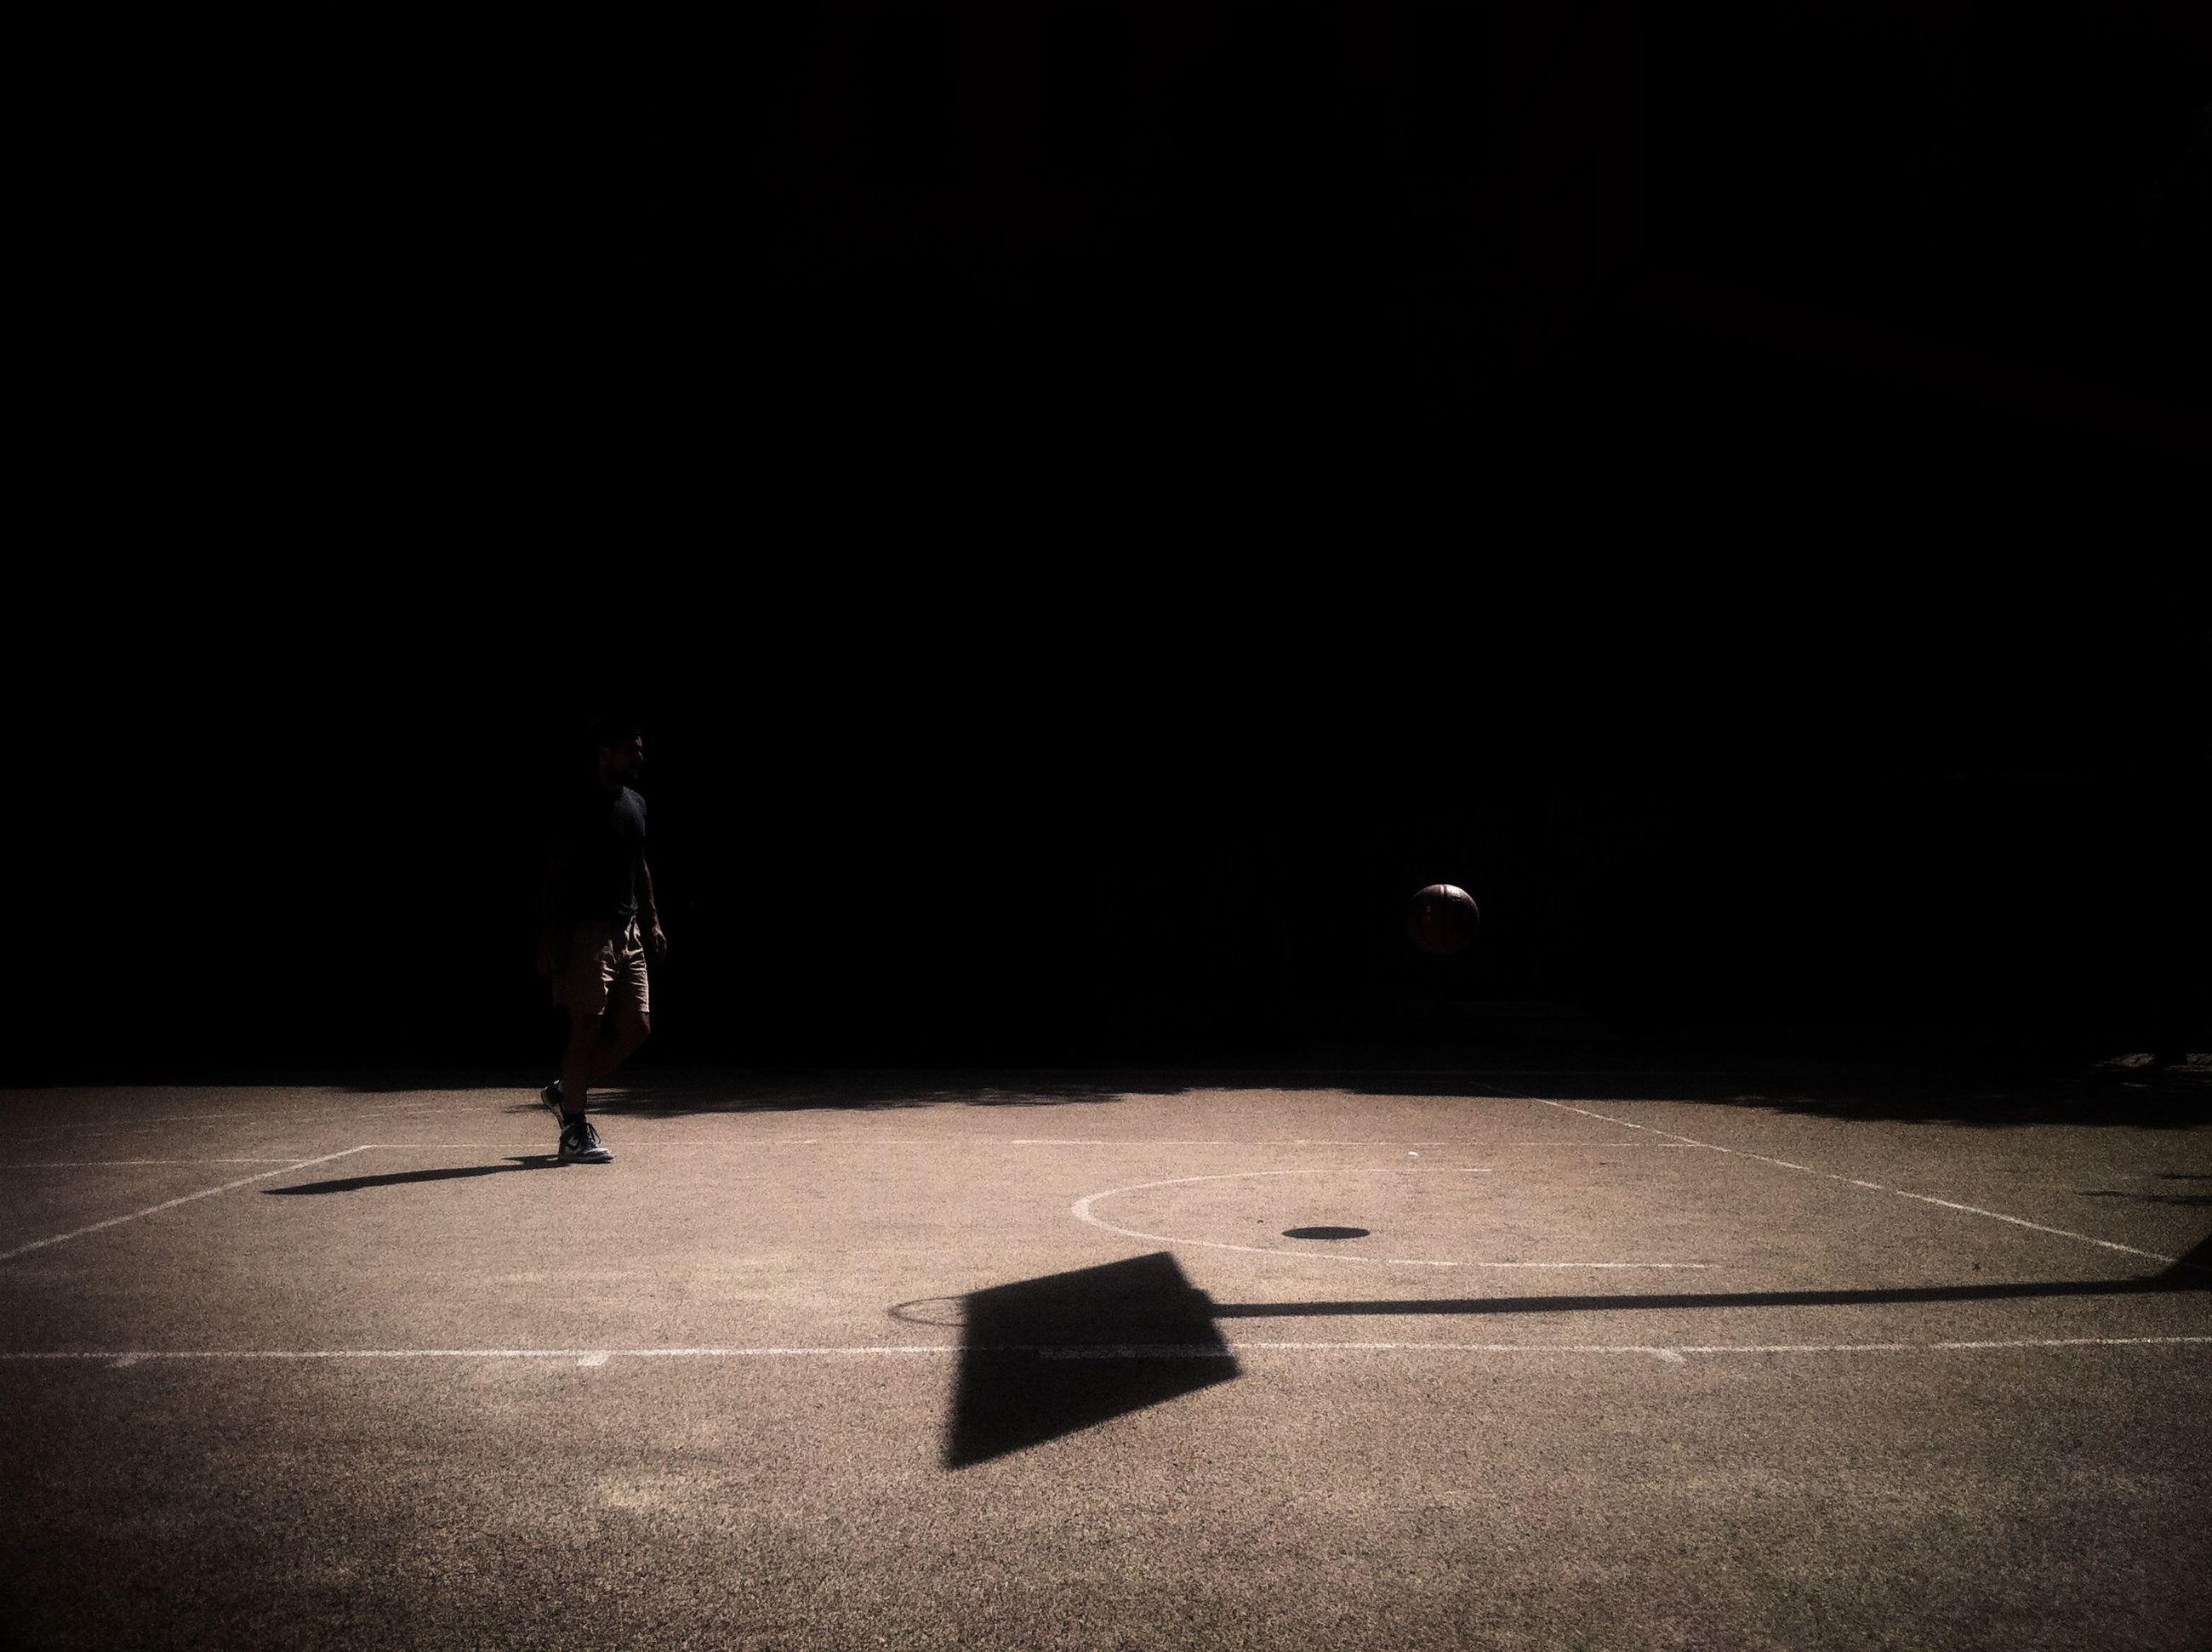 night, dark, illuminated, copy space, indoors, shadow, silhouette, street, light - natural phenomenon, road, transportation, empty, lighting equipment, darkness, side view, full length, darkroom, lifestyles